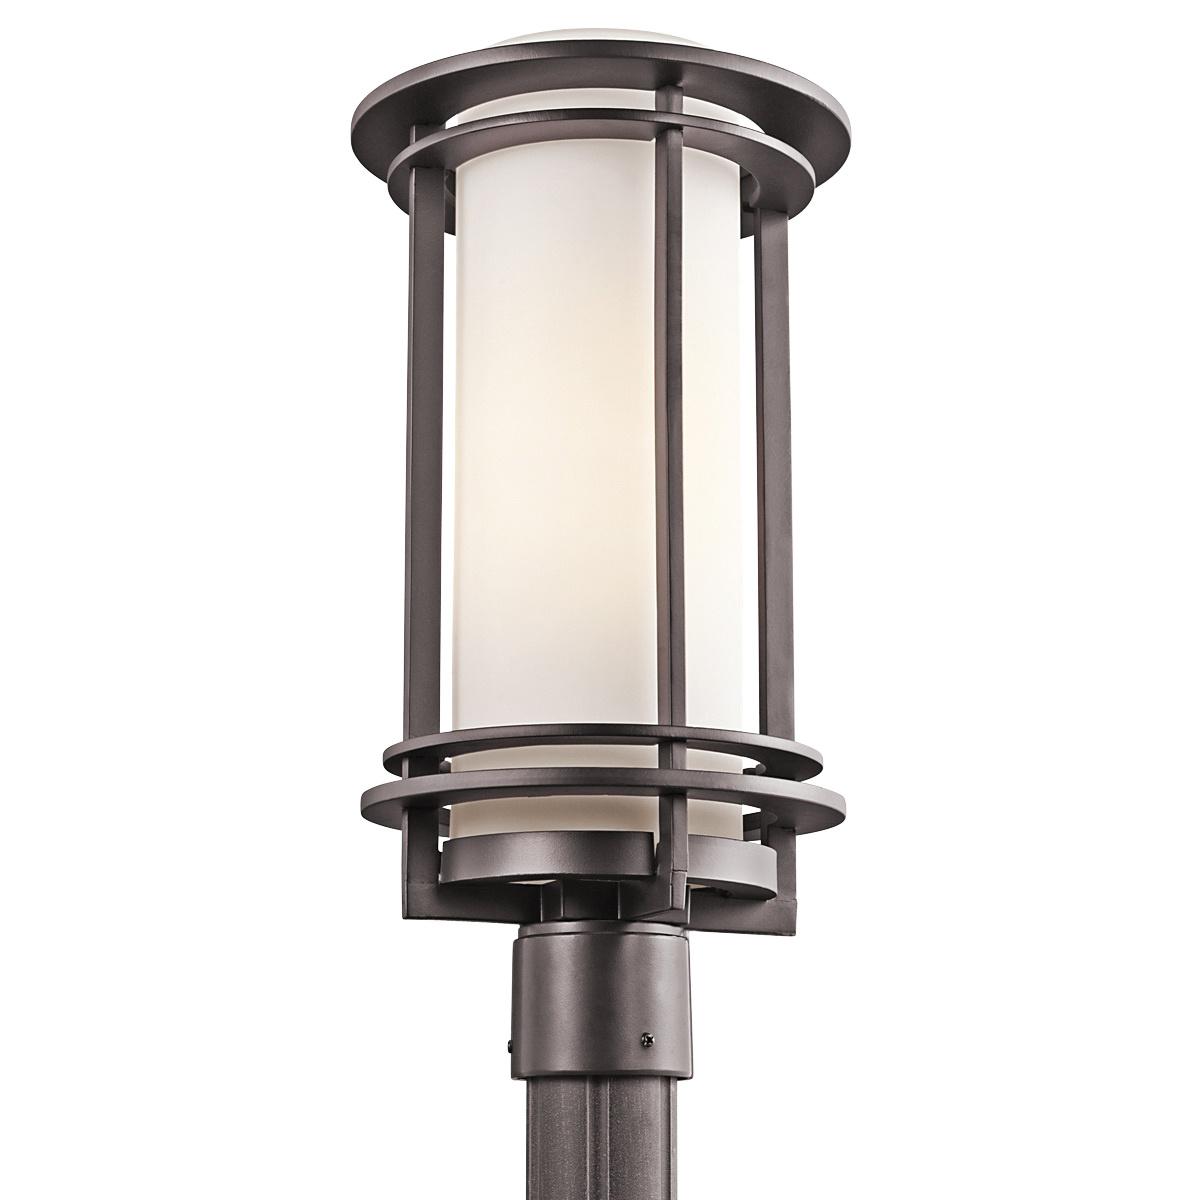 Kichler 49349az outdoor post mount light 150 watt 120 volt ac post kichler 49349az outdoor post mount light 150 watt 120 volt ac post mount pacific edge aloadofball Choice Image